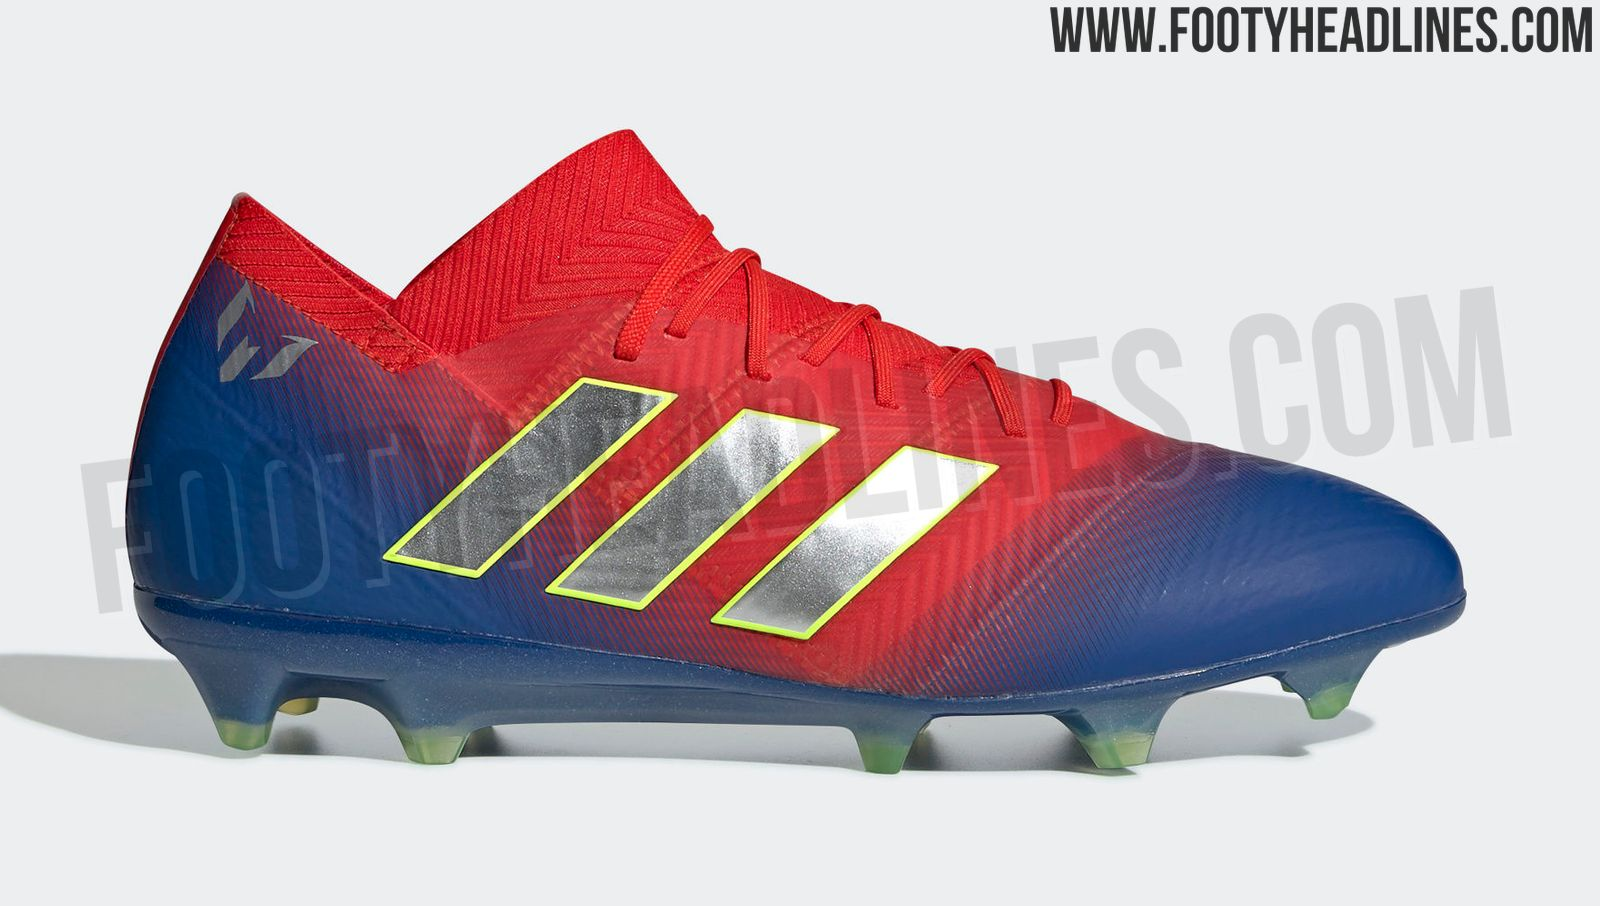 c503ba1acc2 Next Signature Boots For 2019 Copa America (  Champions League Final ...